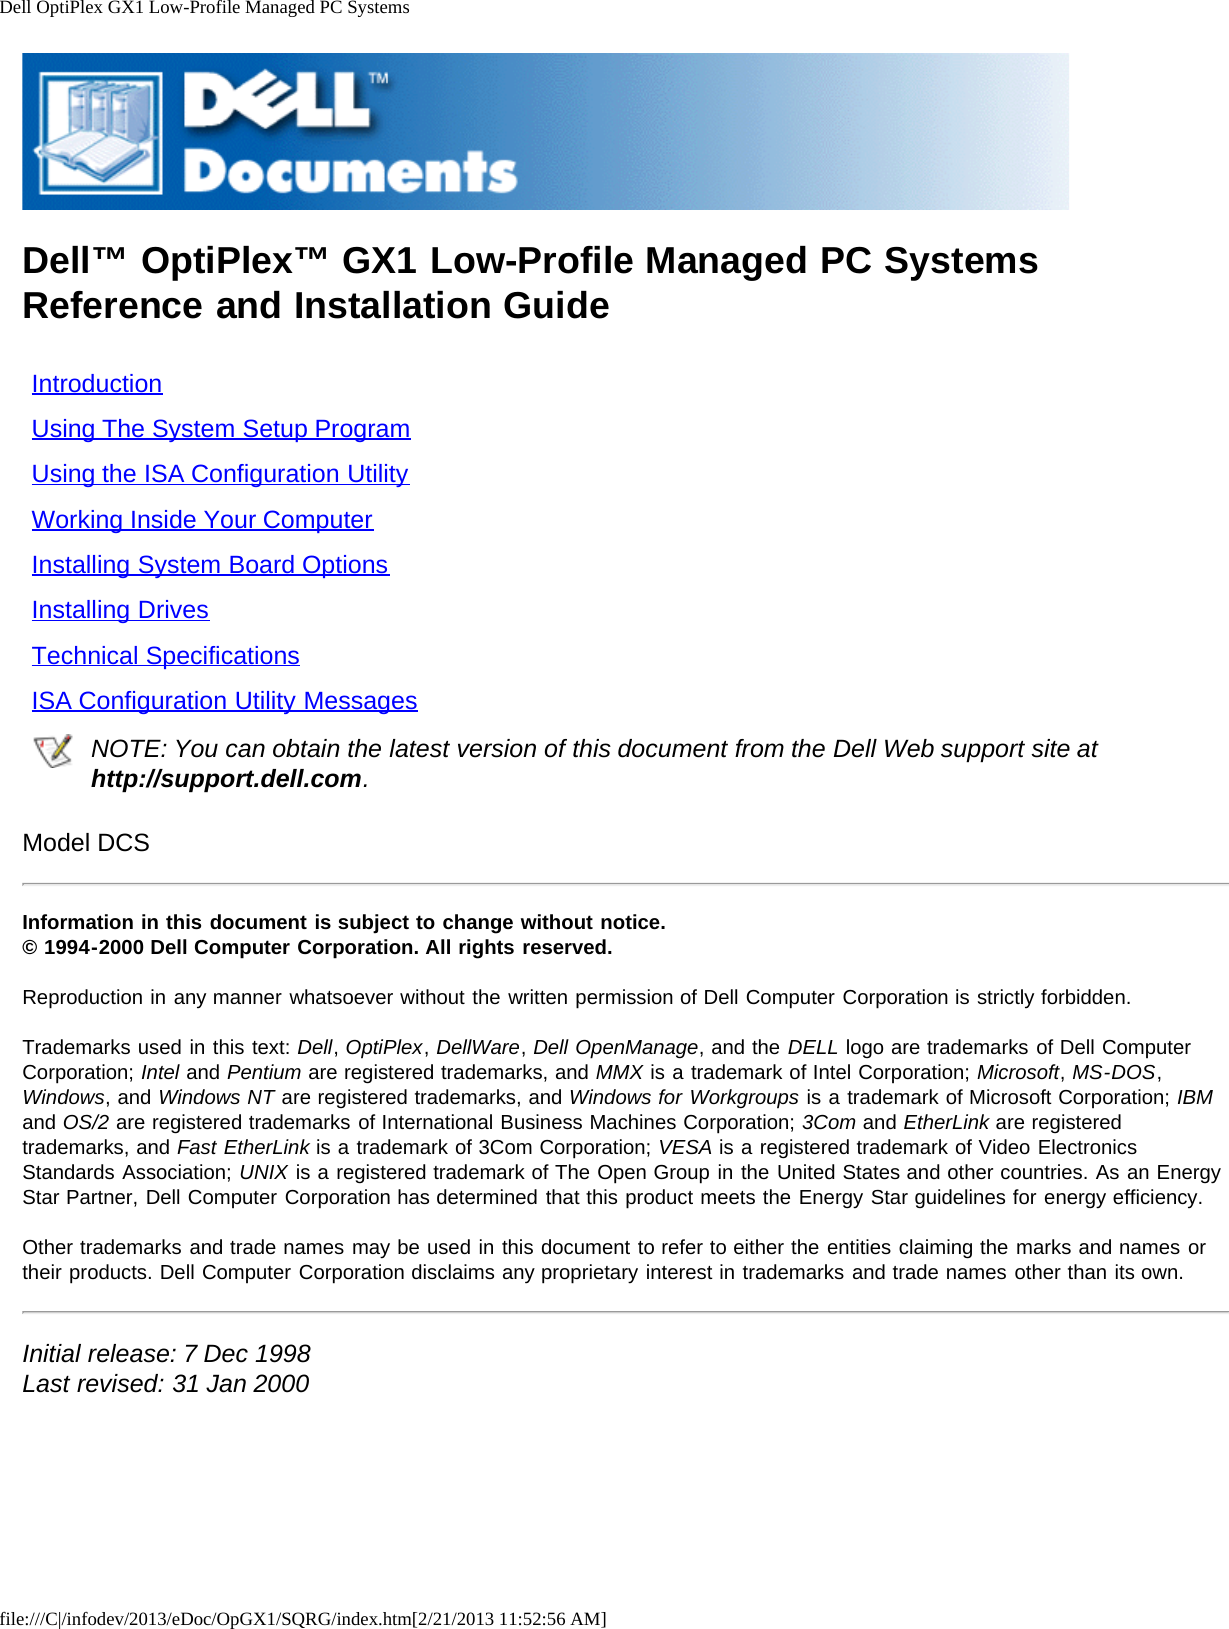 ... desktops optiplex gx1 pdf user u0027s manual free download Array - dell  optiplex gx1 quick start guide reference and installation rh usermanual wiki